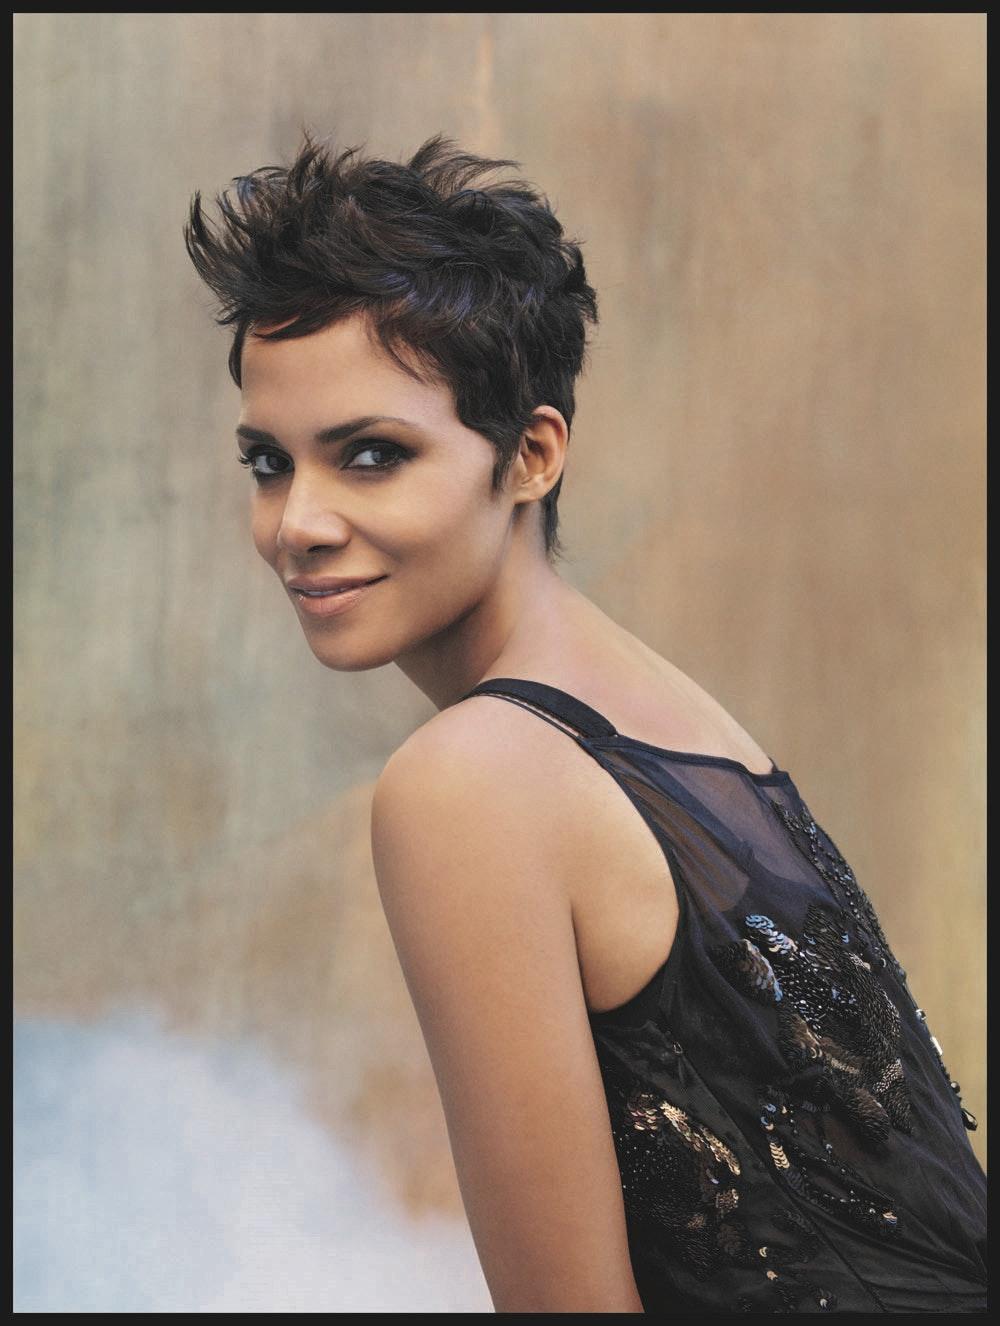 Academy Award-winning actress, Philanthropist